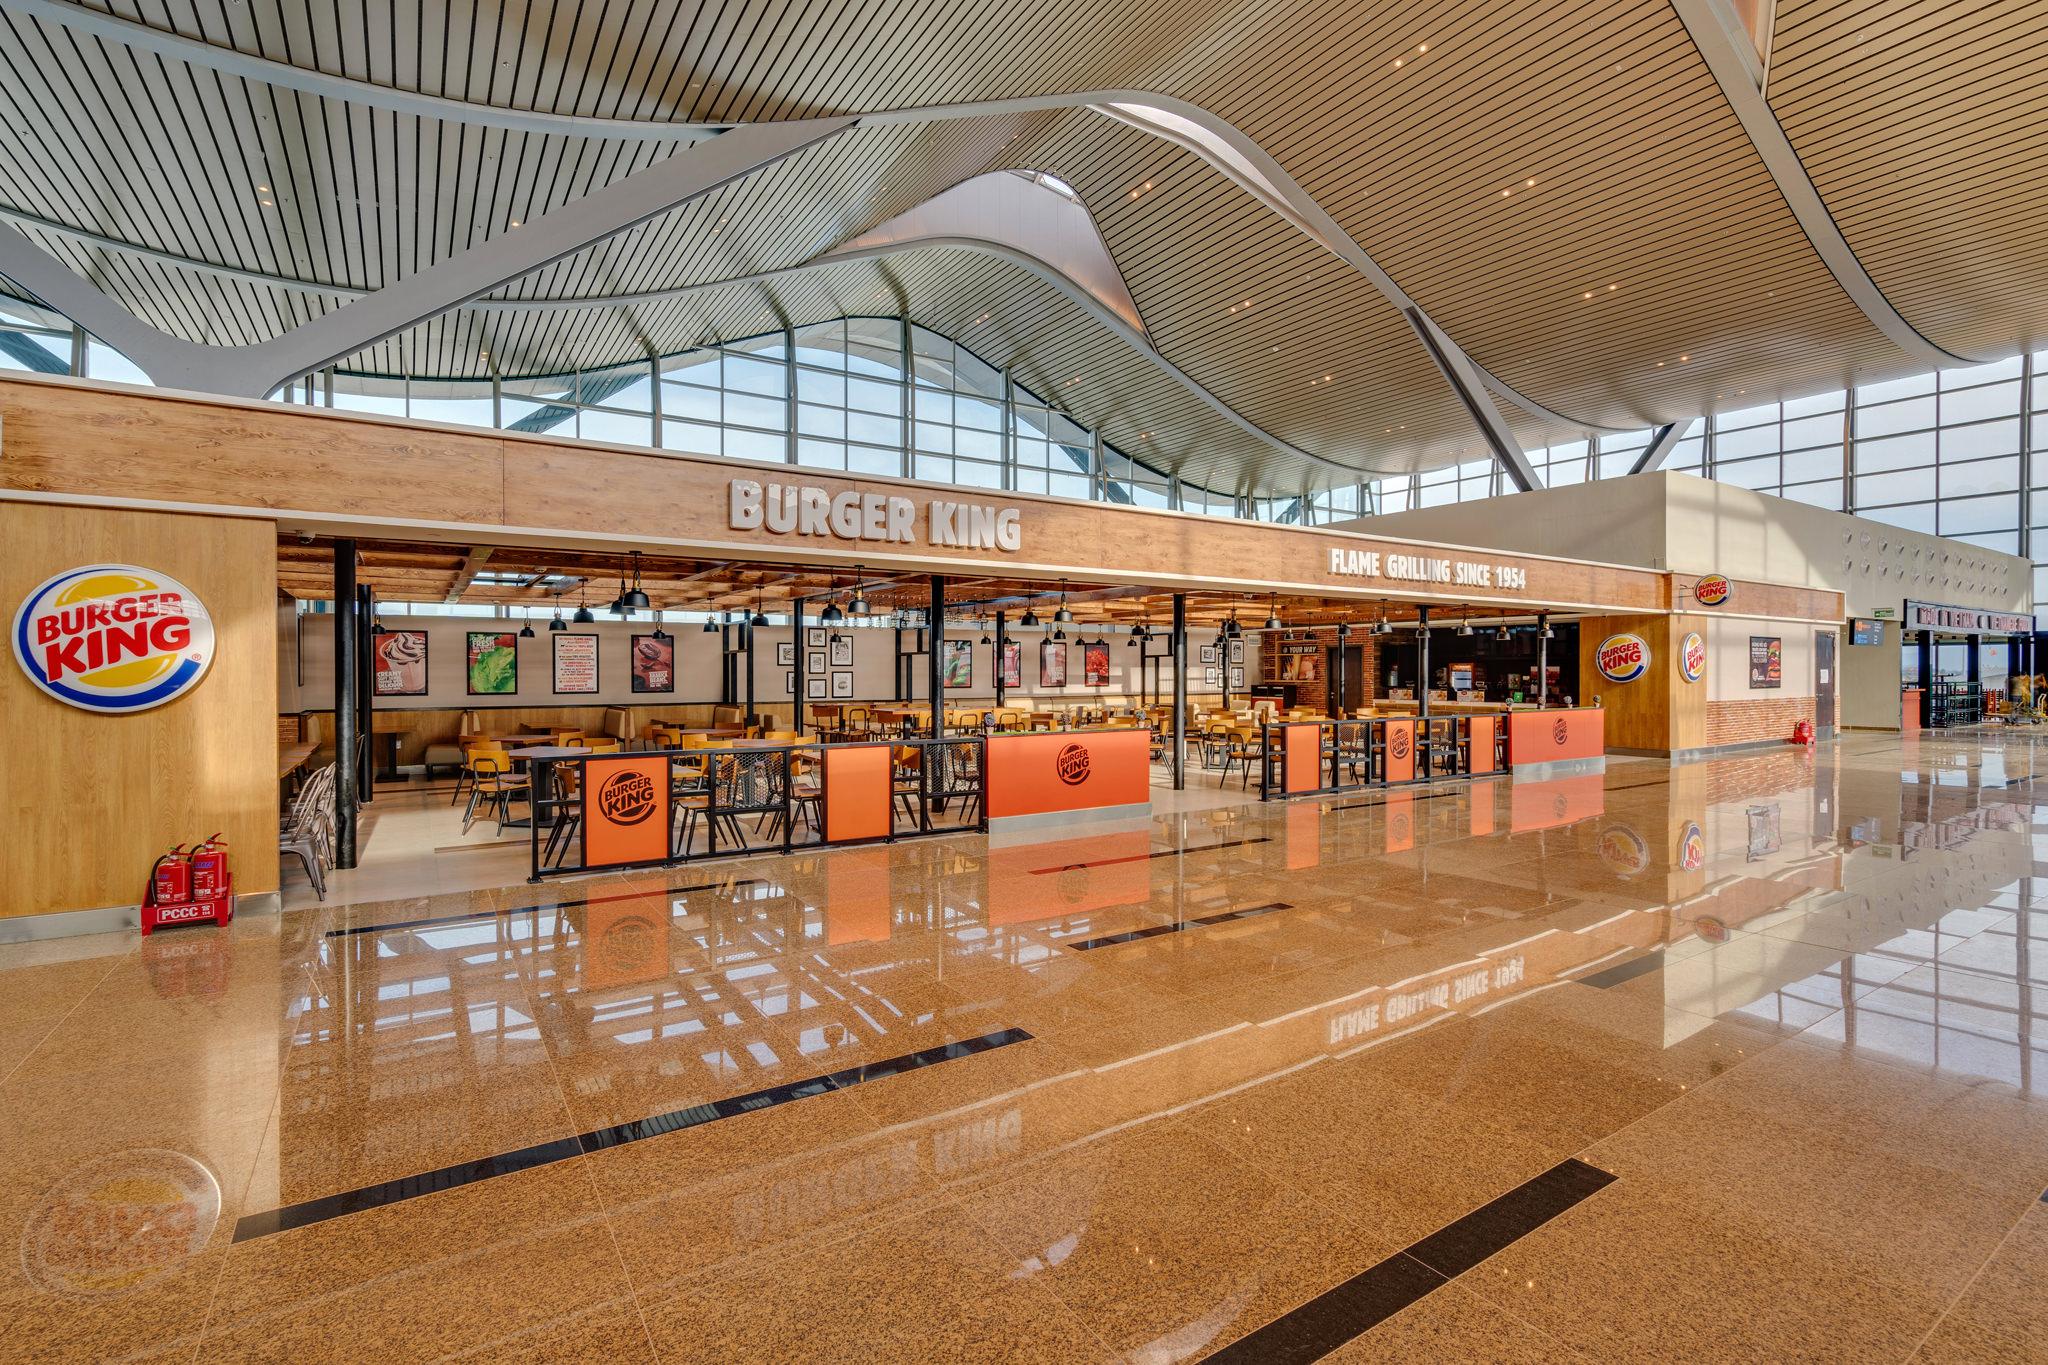 20180626 - Cam Ranh Airport - Architecture - 0340.jpg